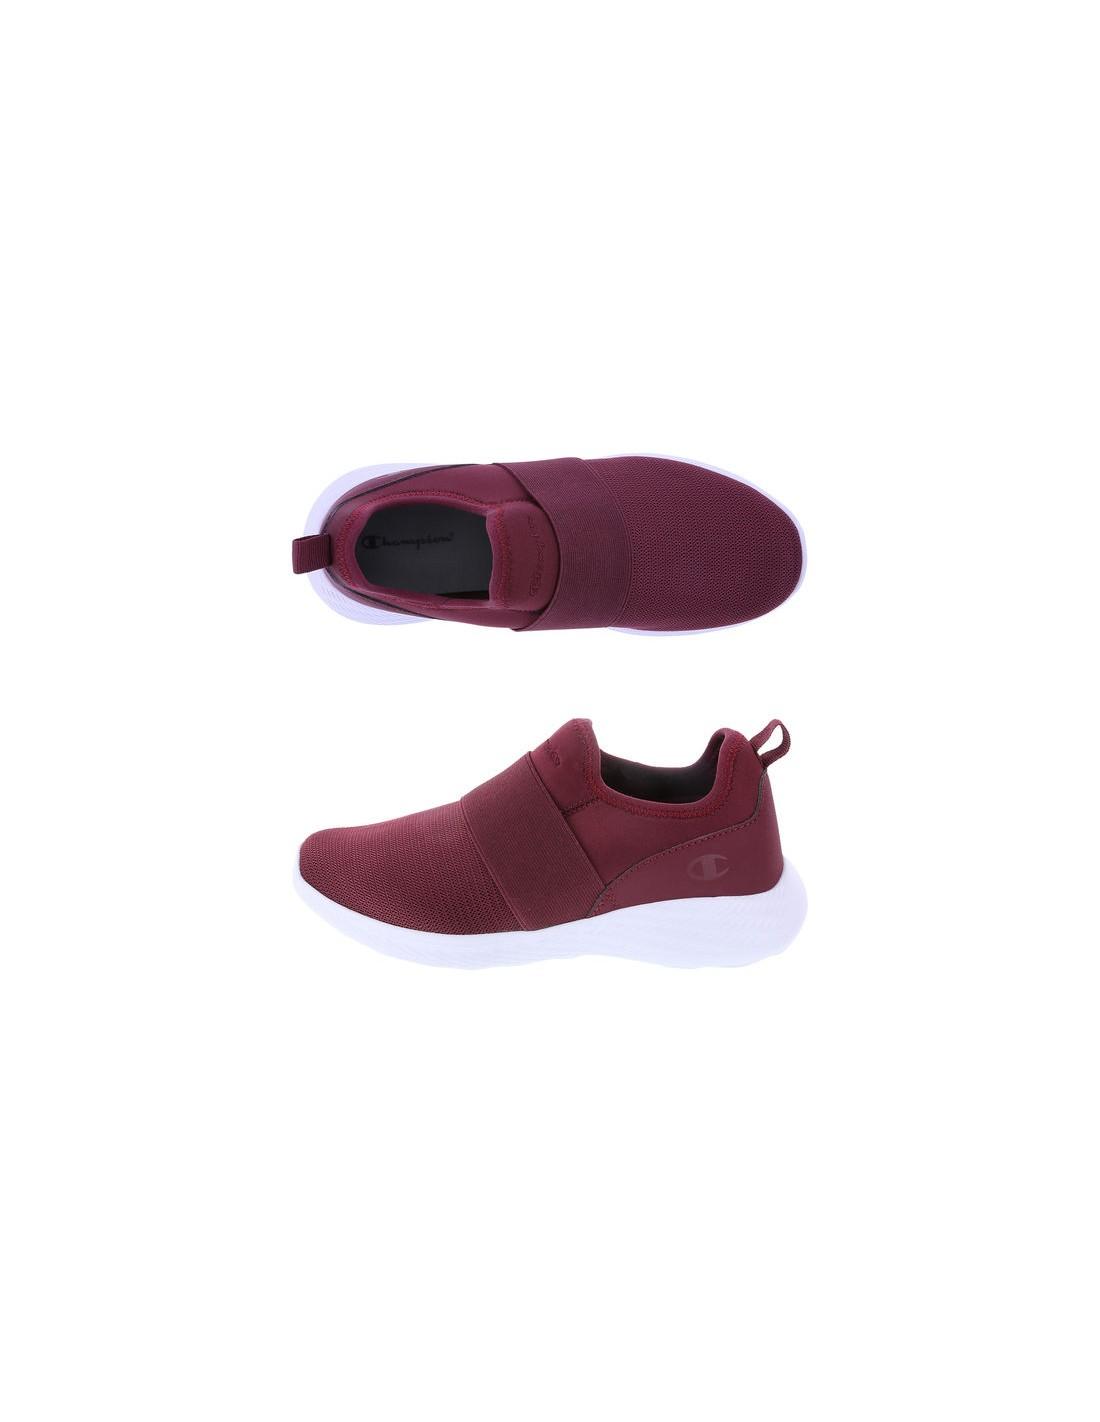 9b52d264ab Zapatos sin cordones Strike para mujer